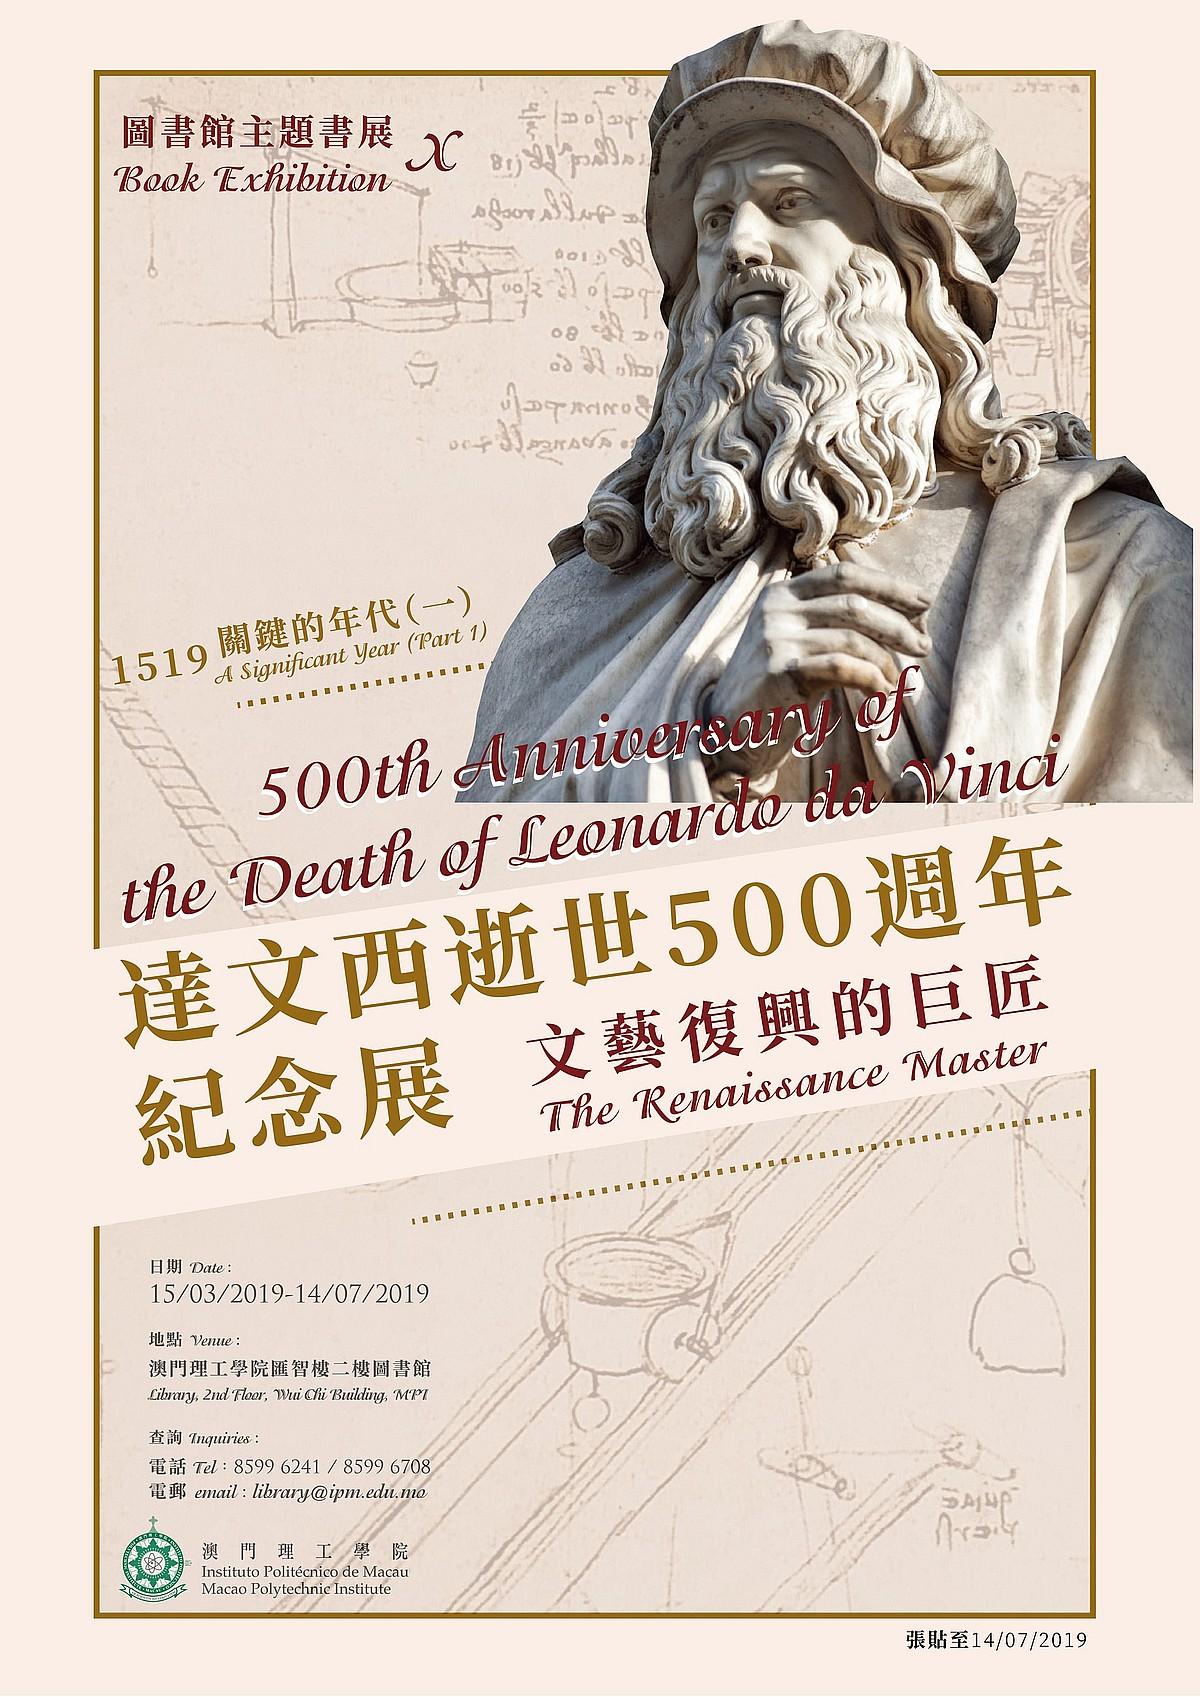 1519 – A Significant Year (Part 1) - The Renaissance Master: 500th Anniversary of the Death of Leonardo da Vinci